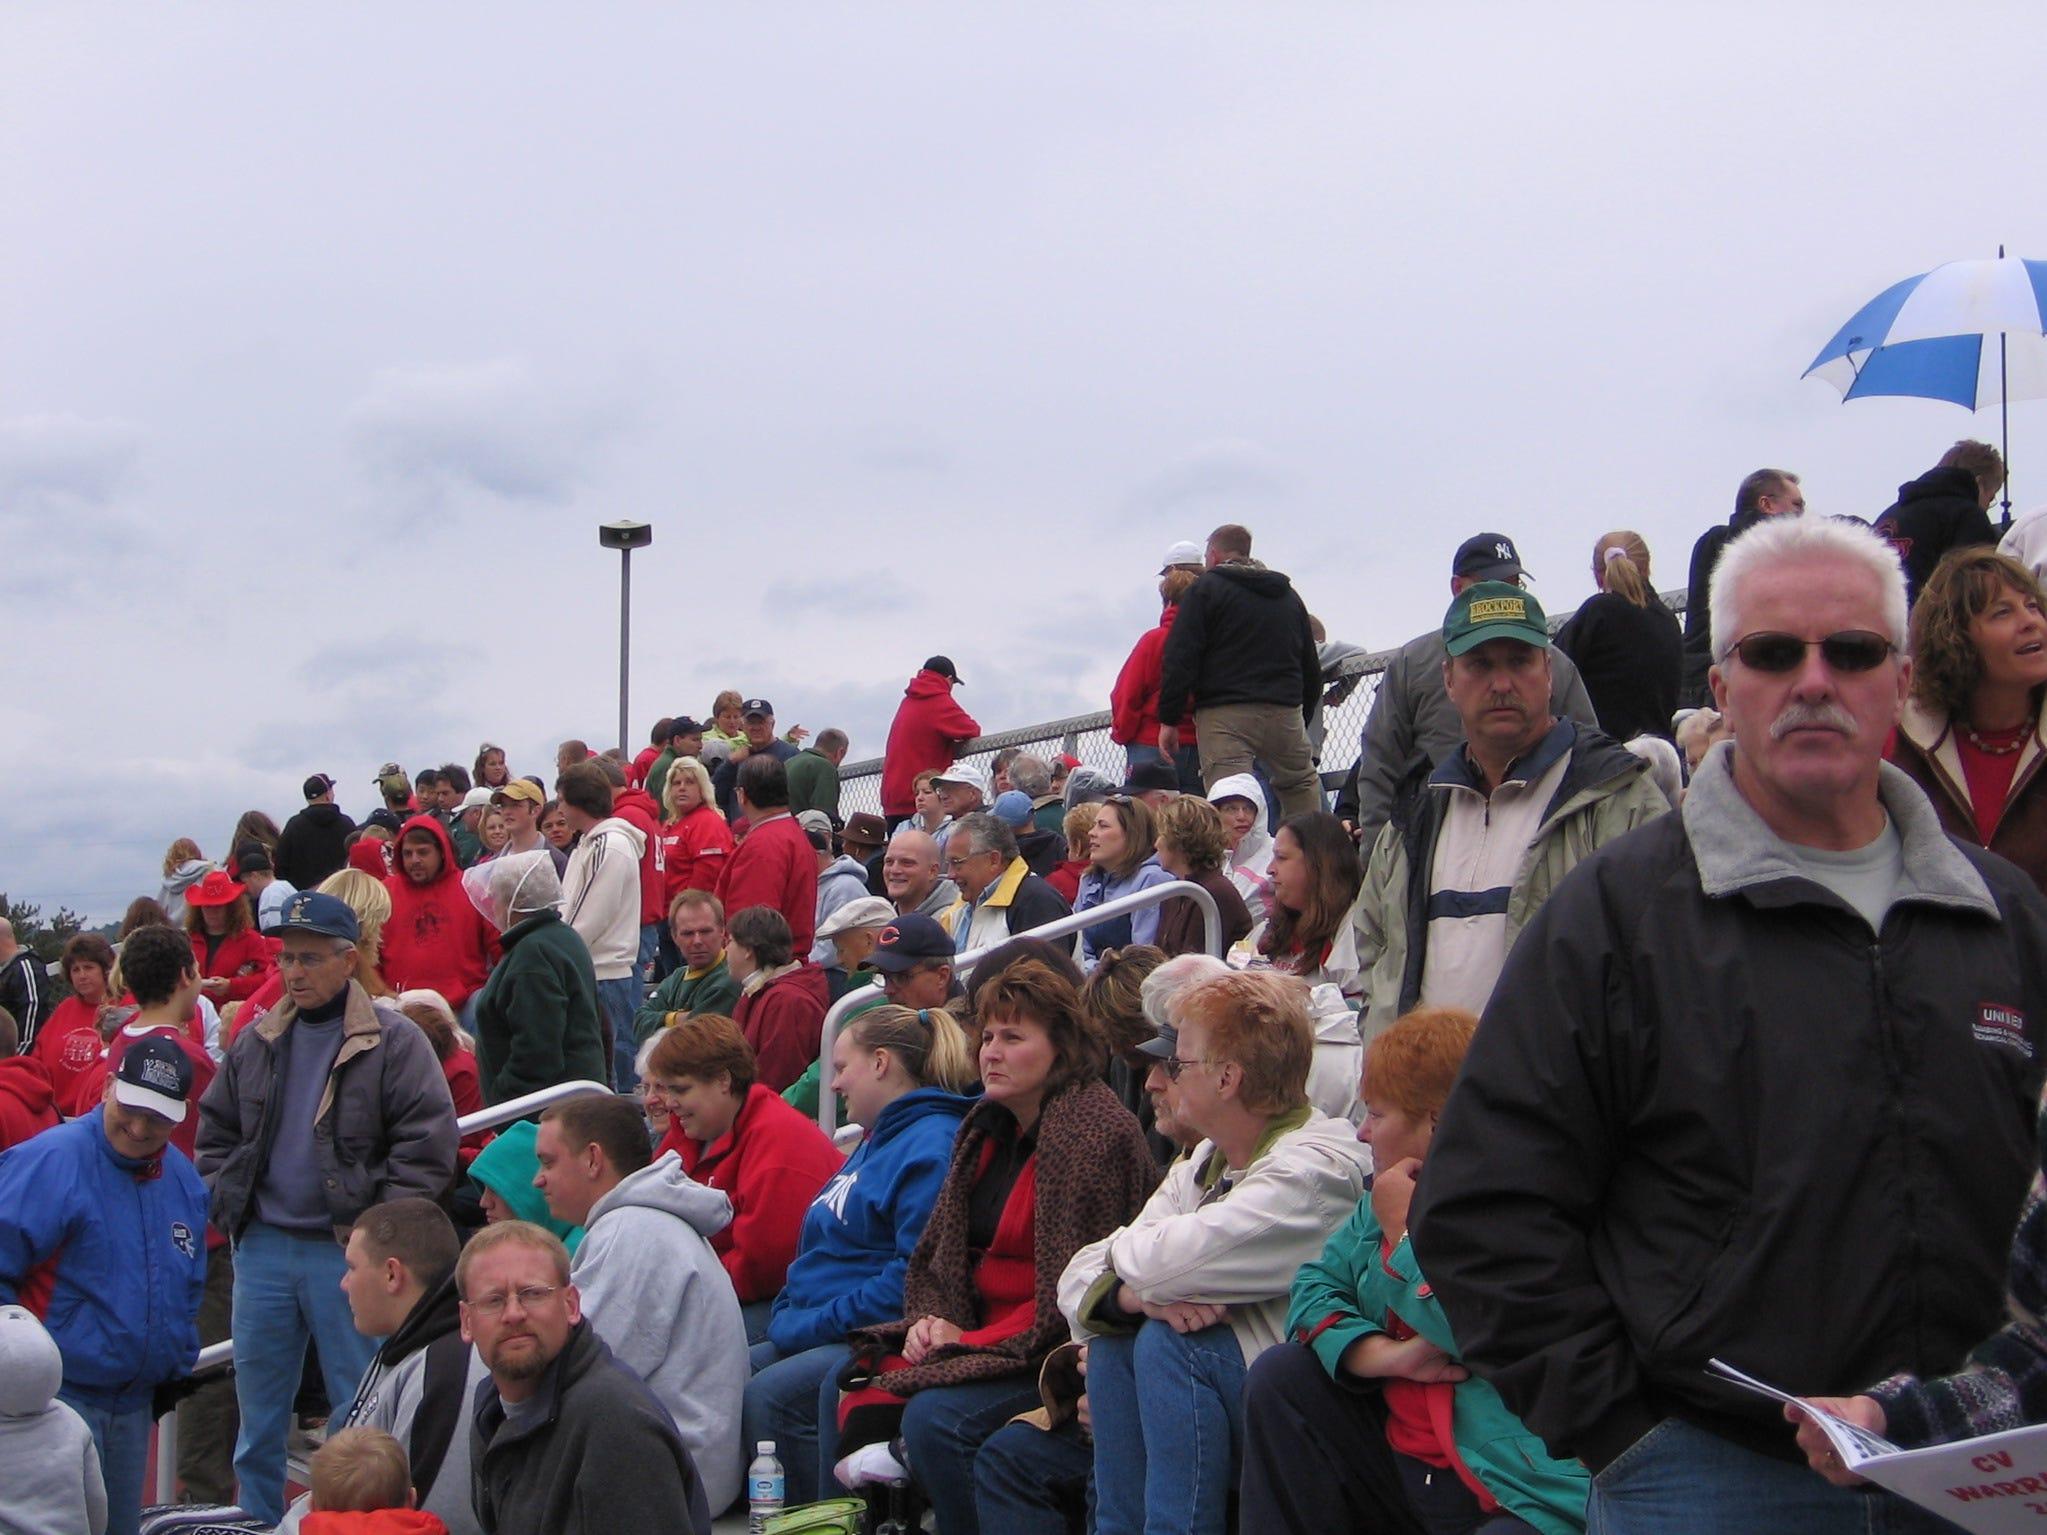 Chenango Forks/Chenango Valley High Schools football game crowd